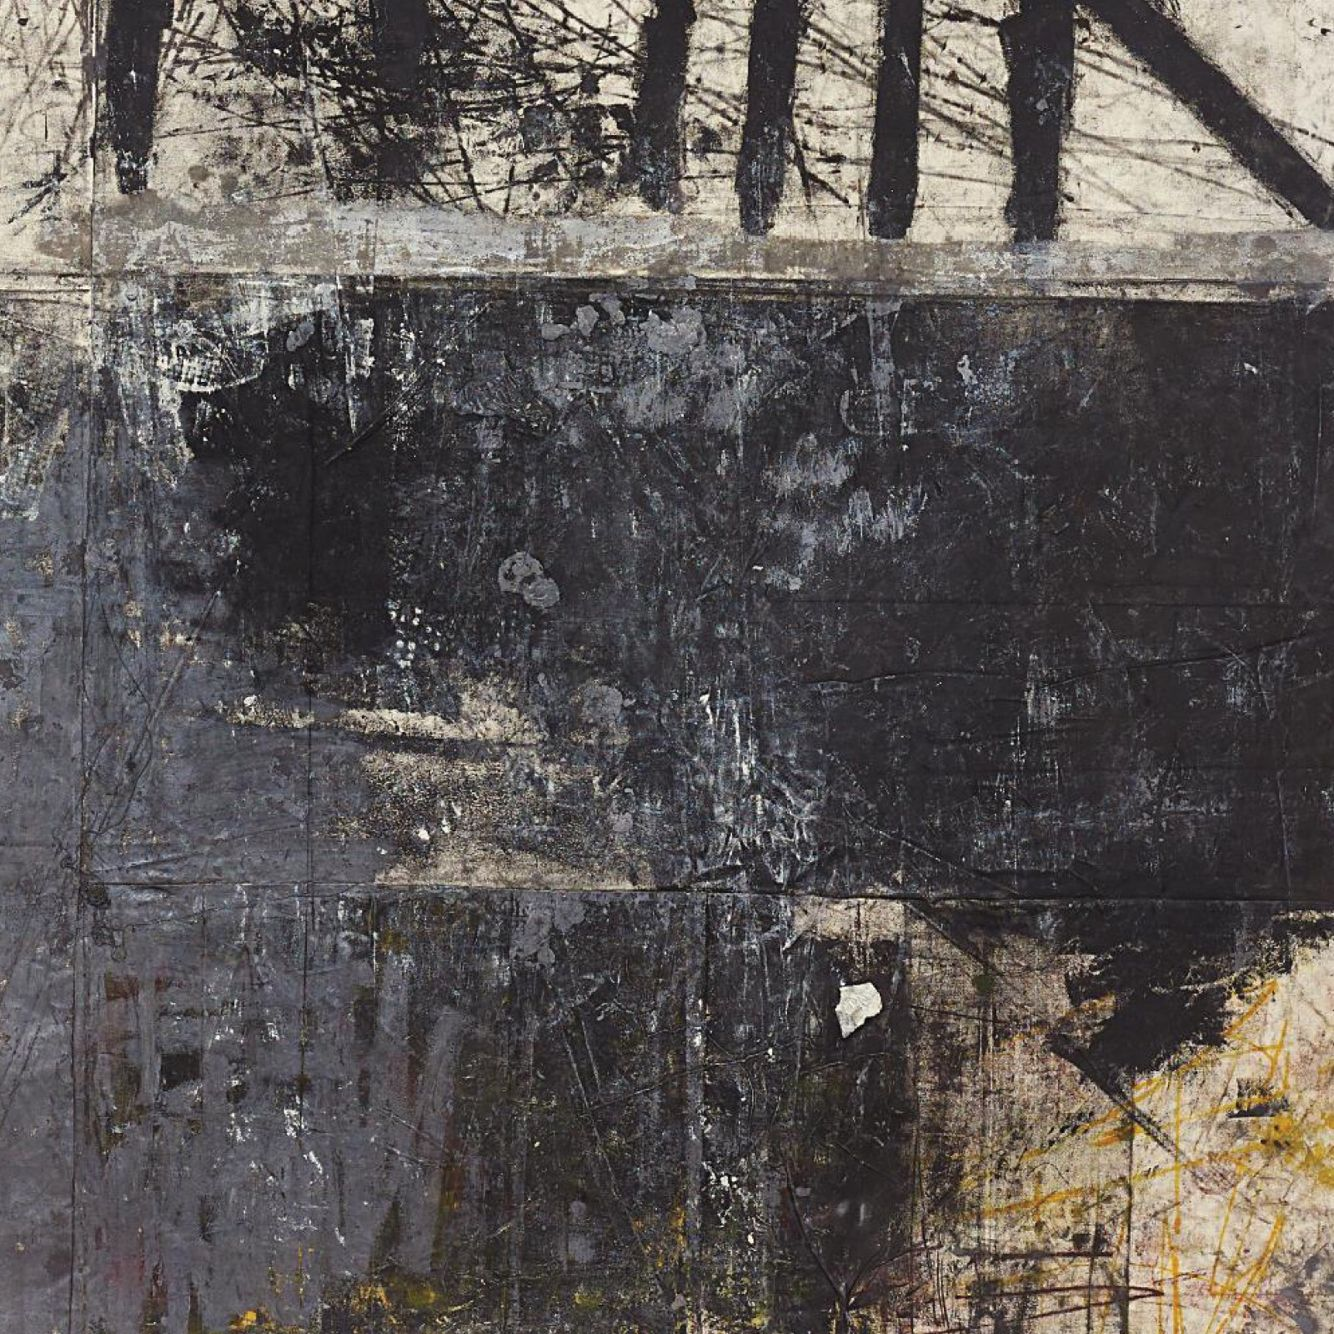 Inspiration: Oscar Murillo, Dark Americano (detail), 2012.